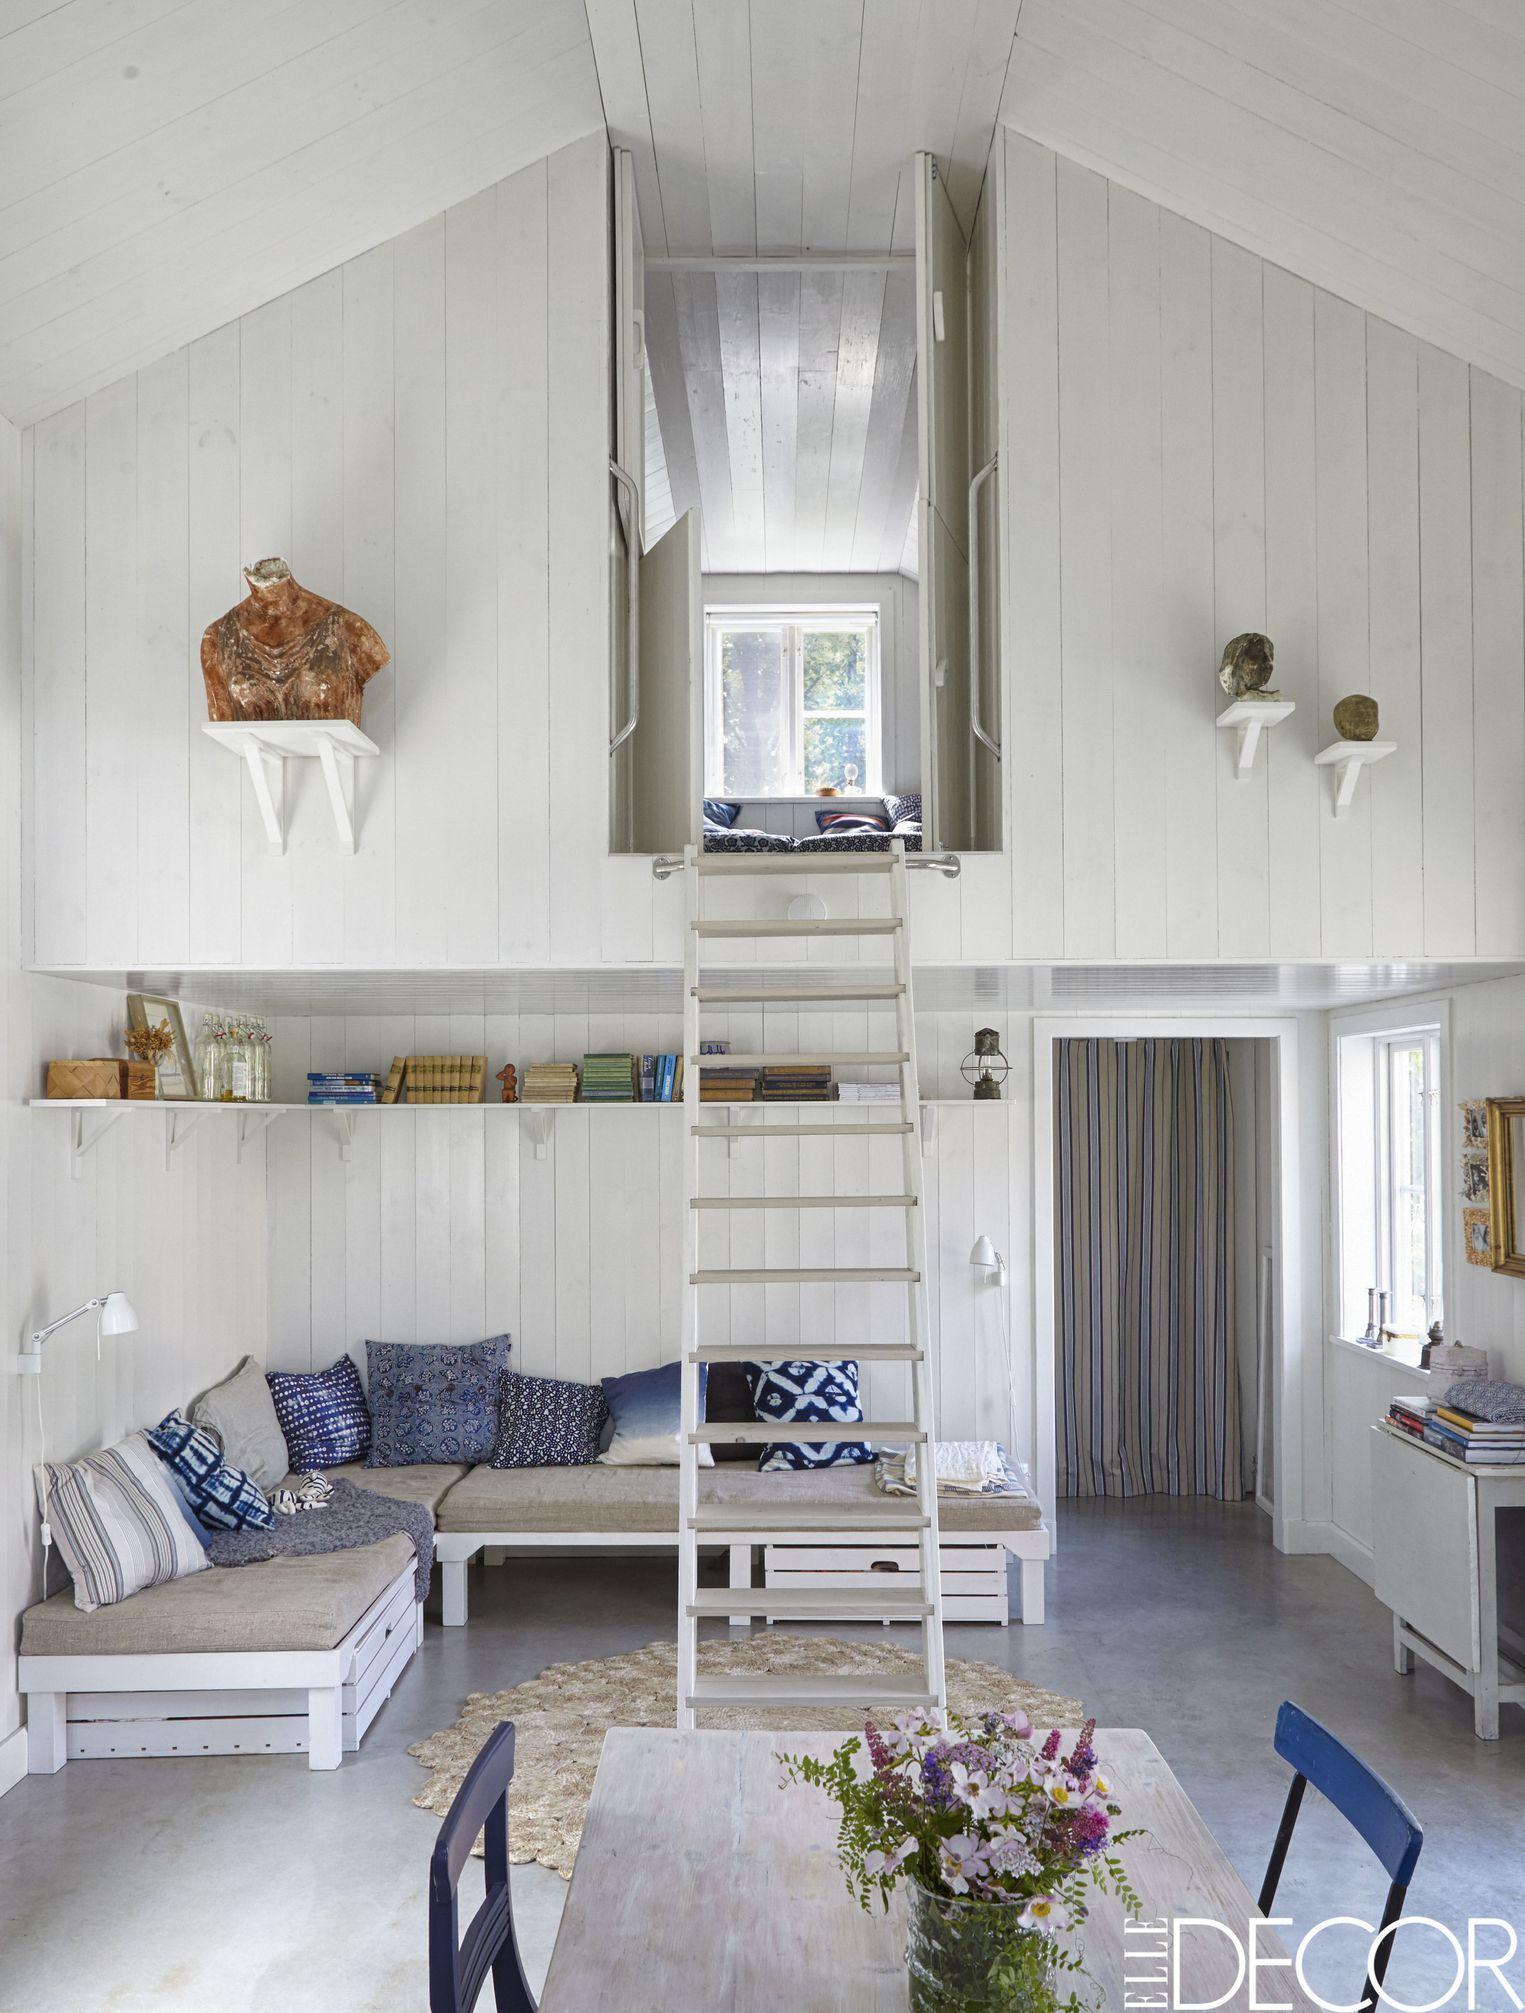 33 Coastal Home Decor Ideas Rooms With Coastal Style